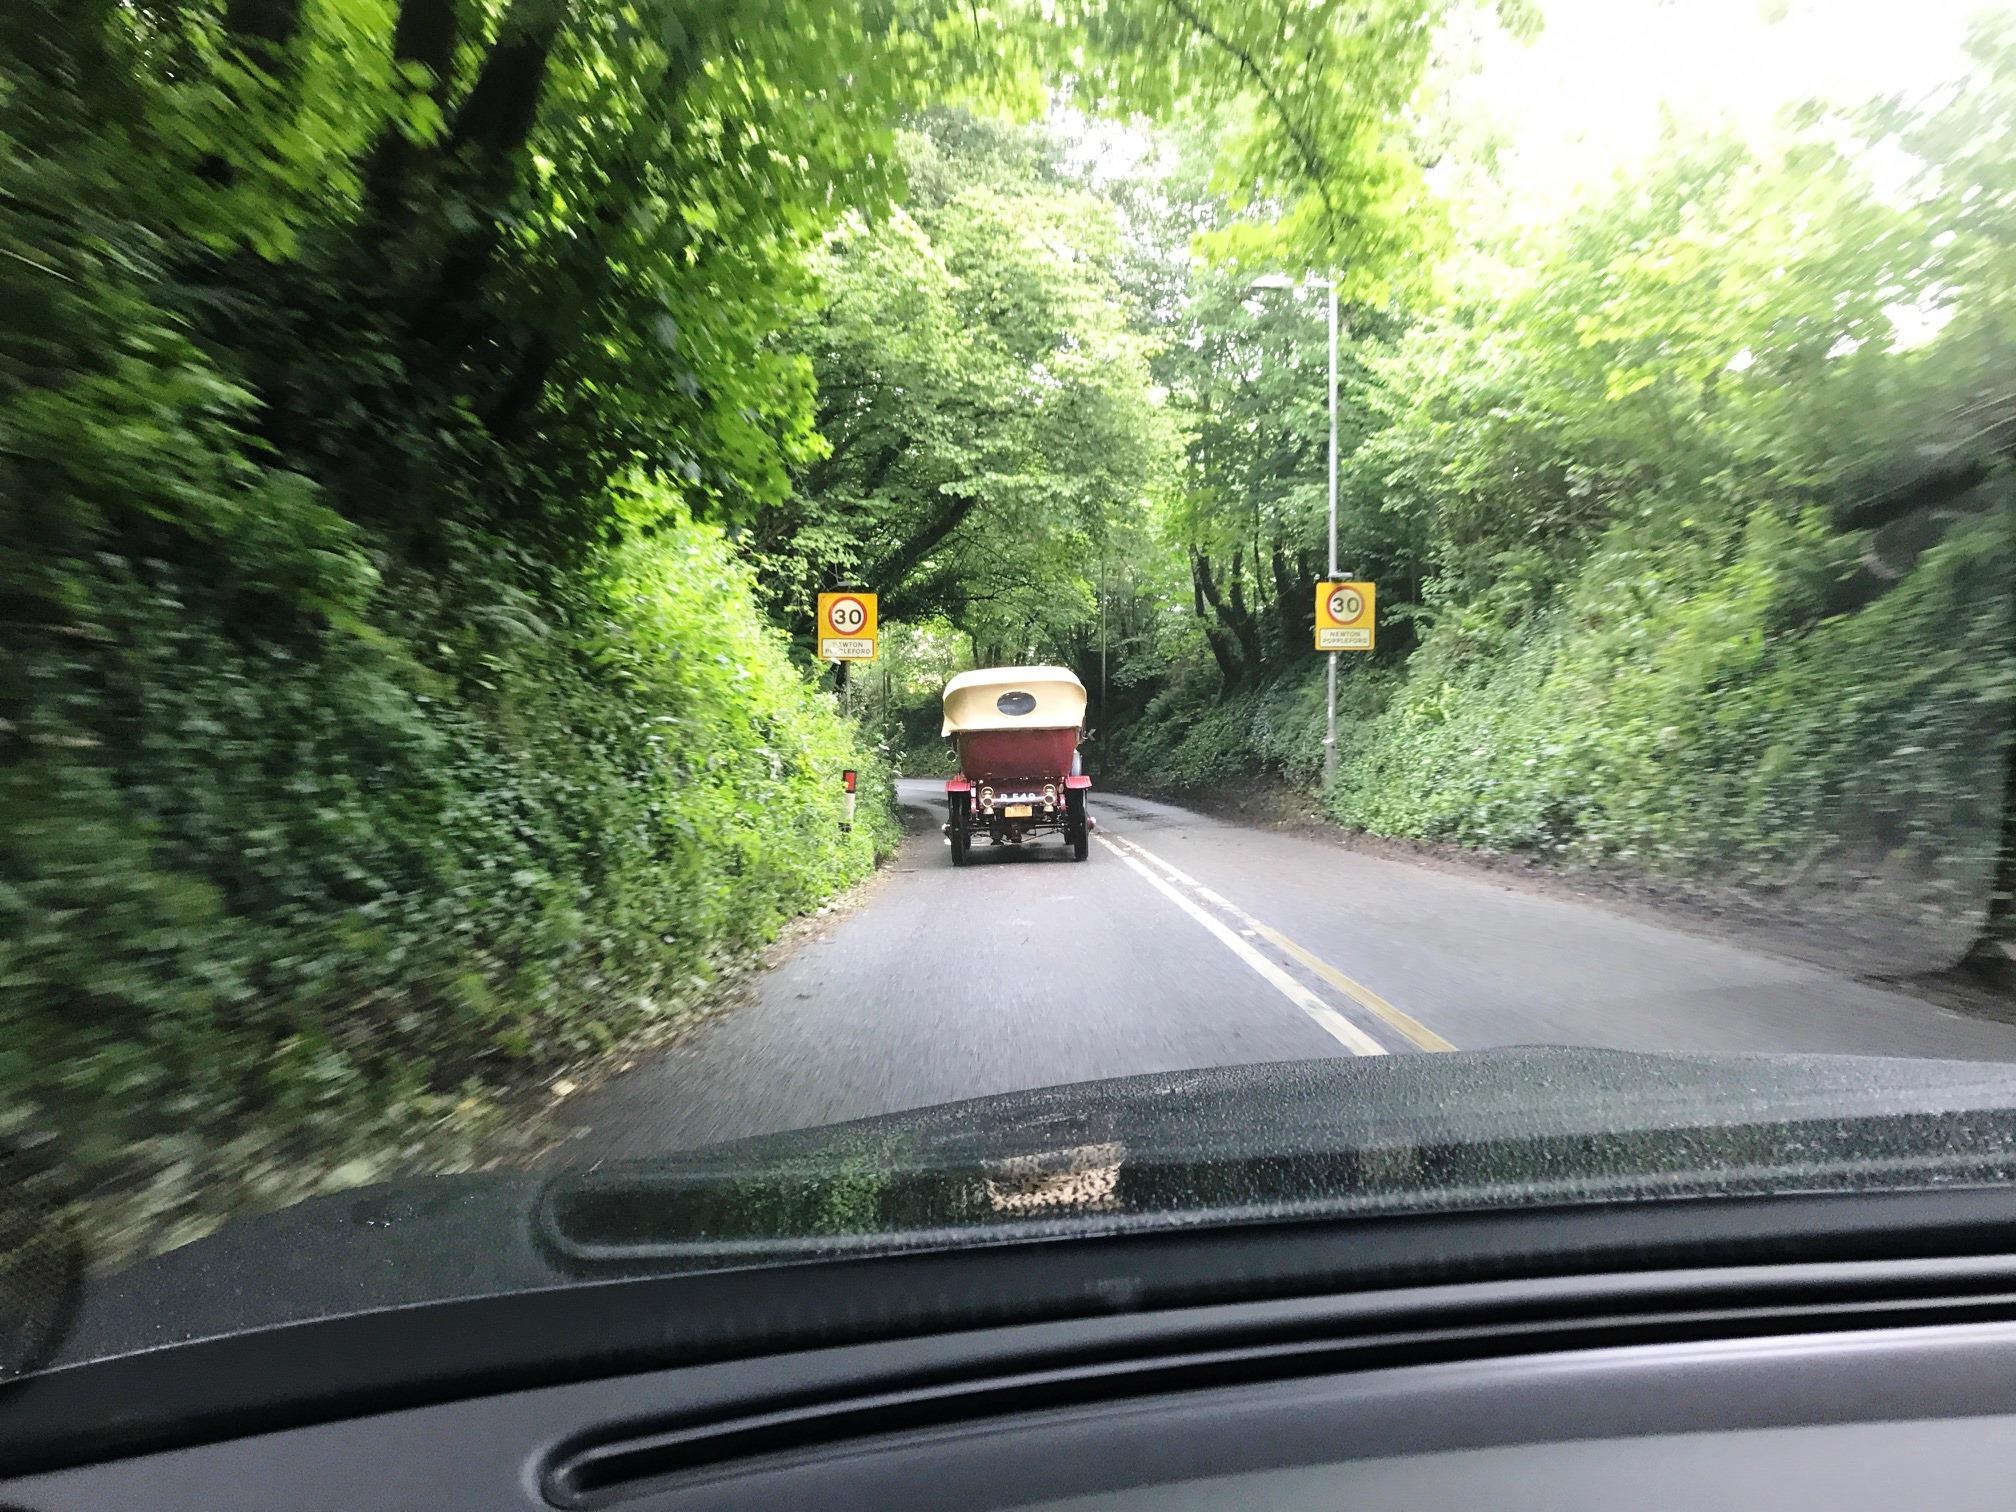 Following a SG in Dorset